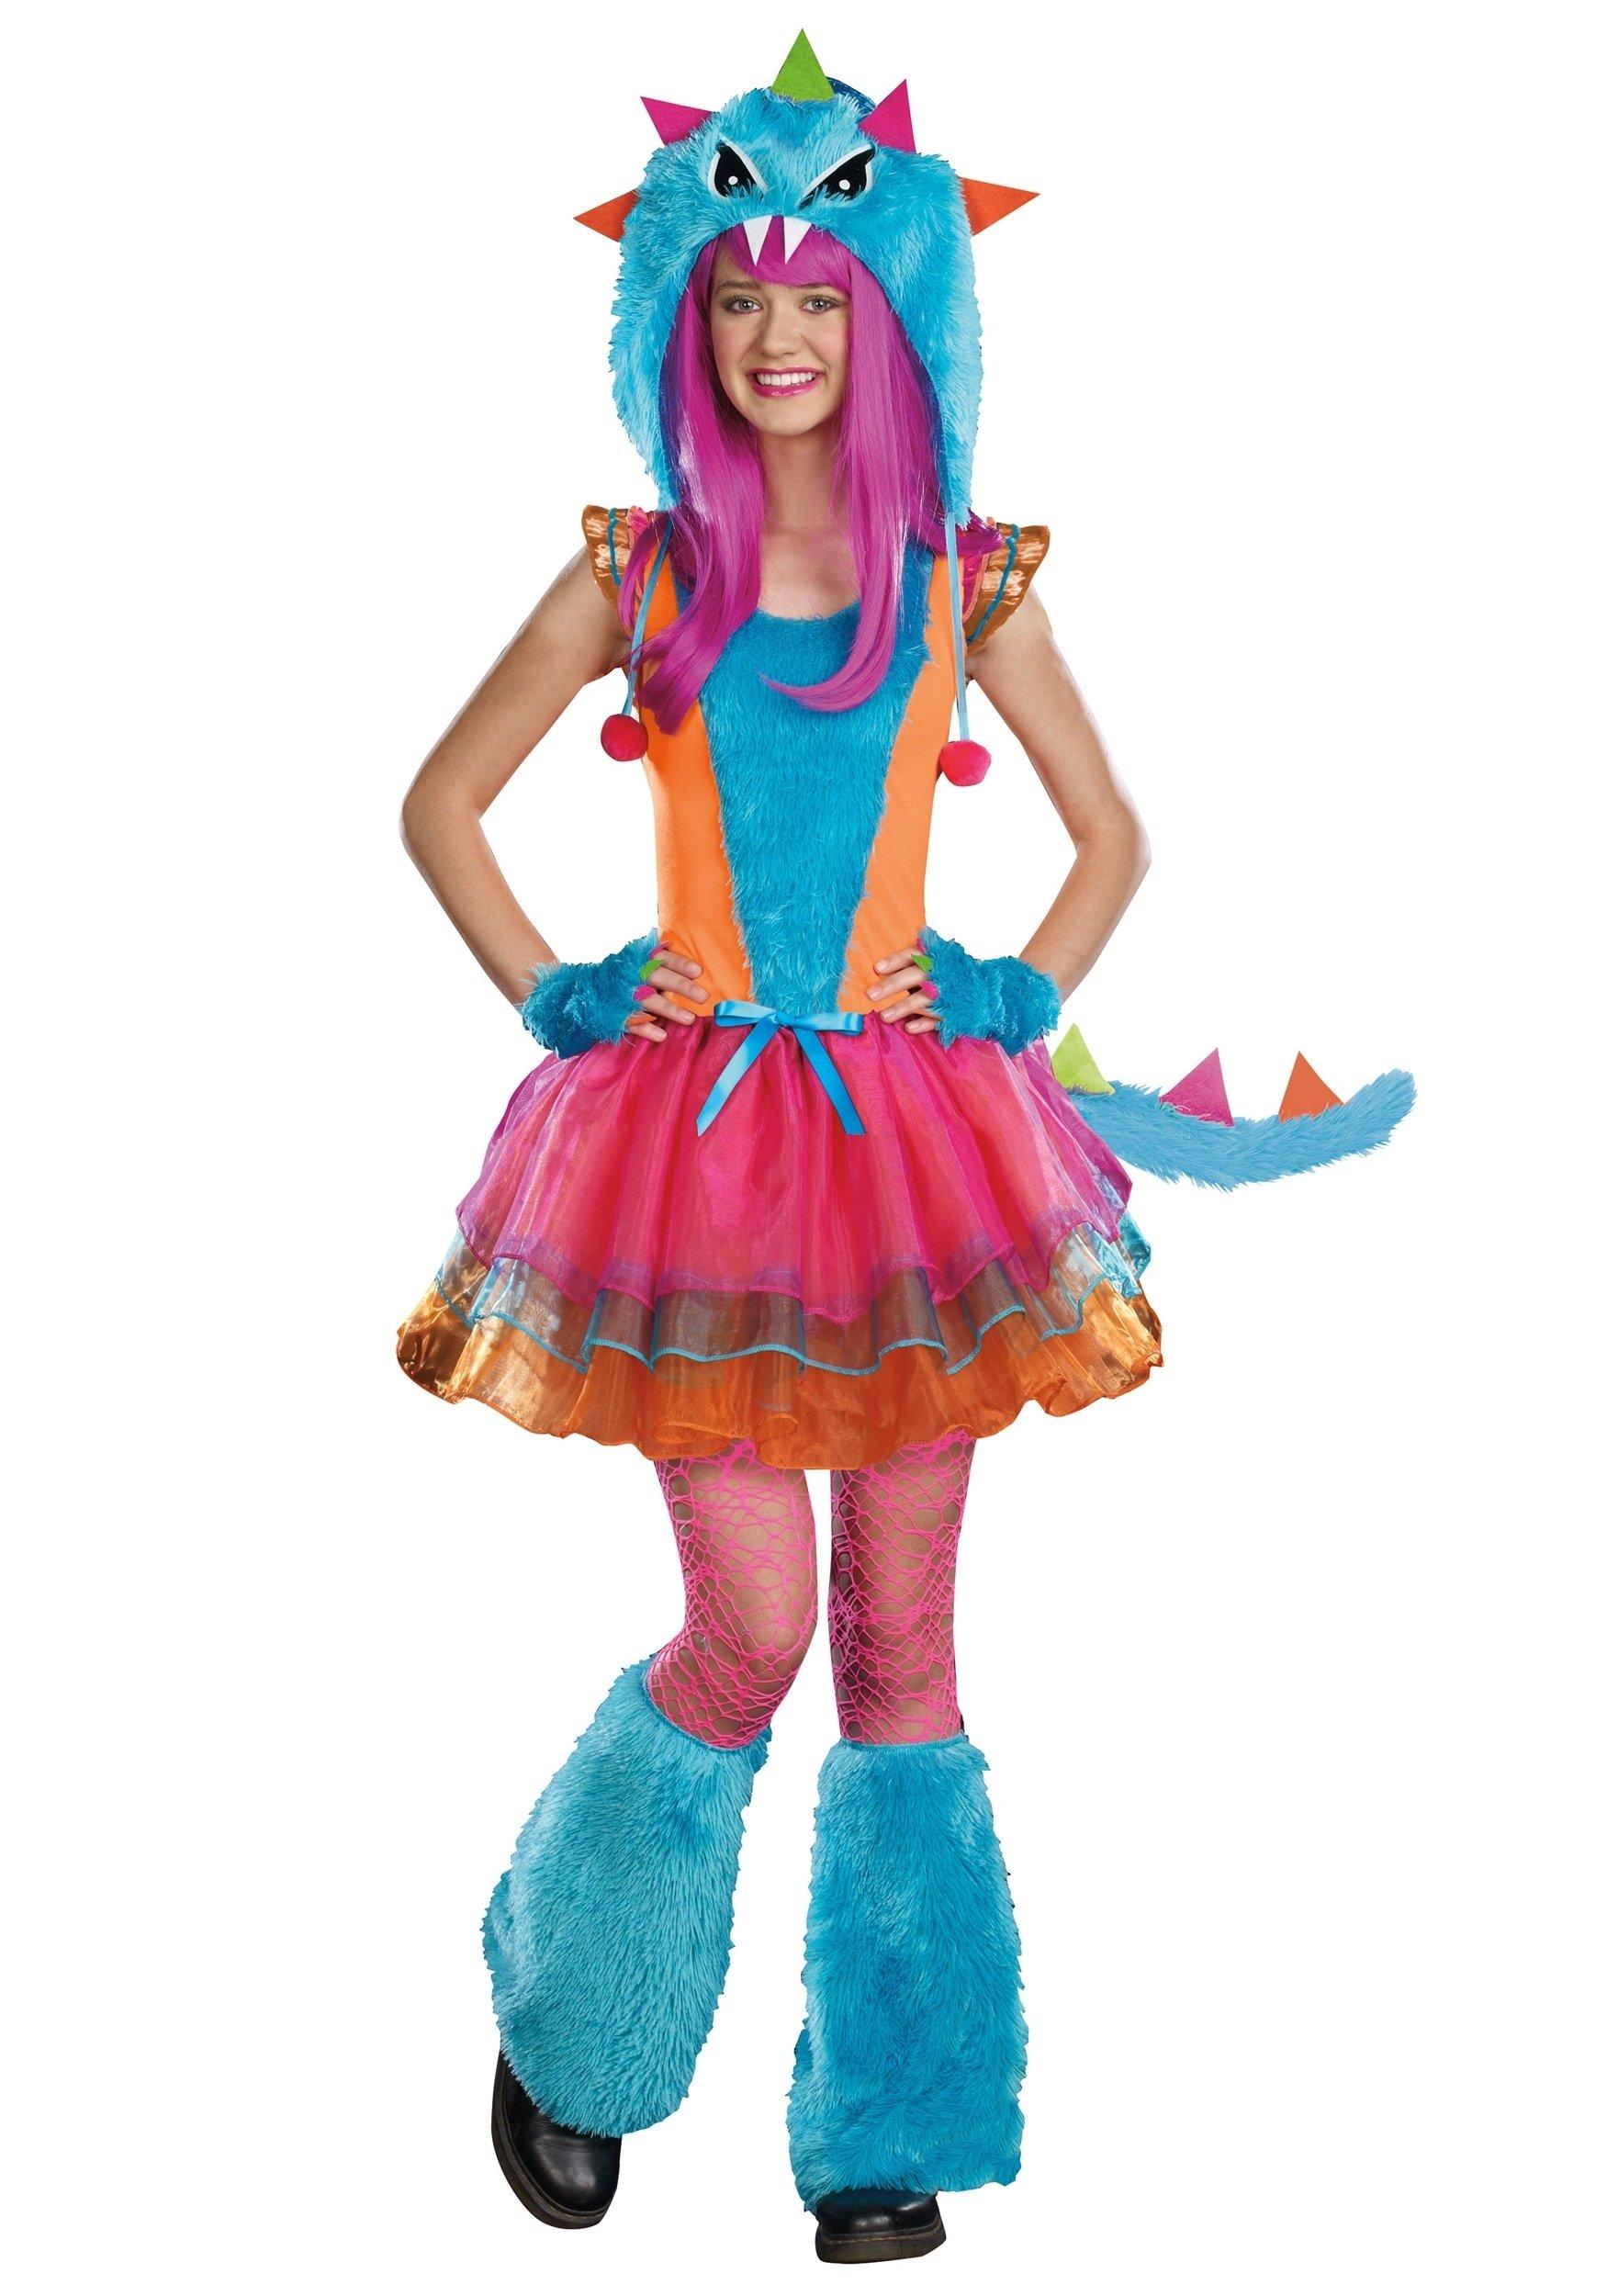 10 Ideal High School Halloween Costume Ideas halloween costumes for teens tweens halloweencostumes 4